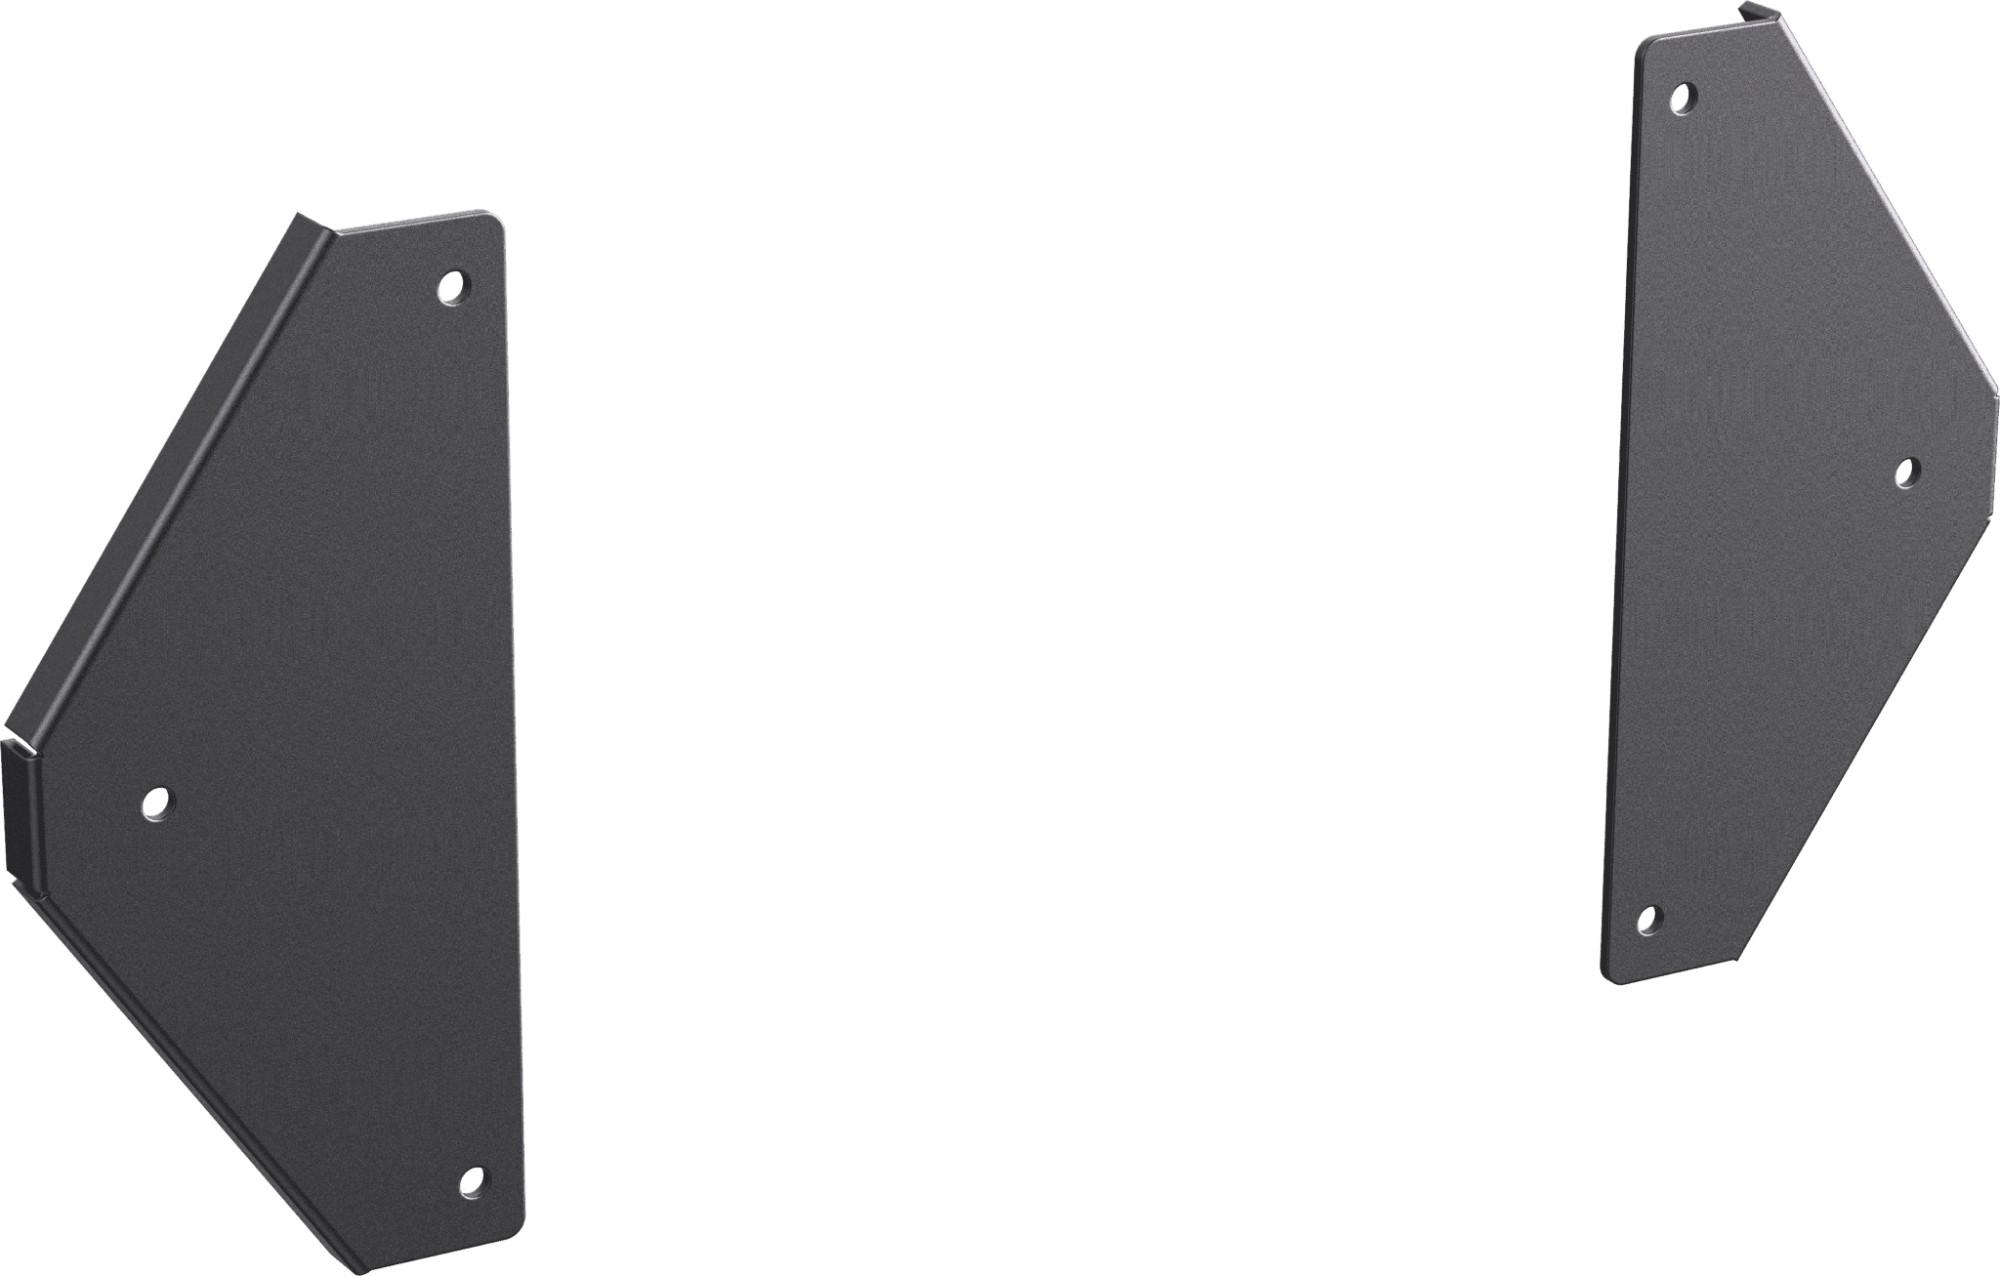 Vision VFM-F40RSBKT monitor mount accessory